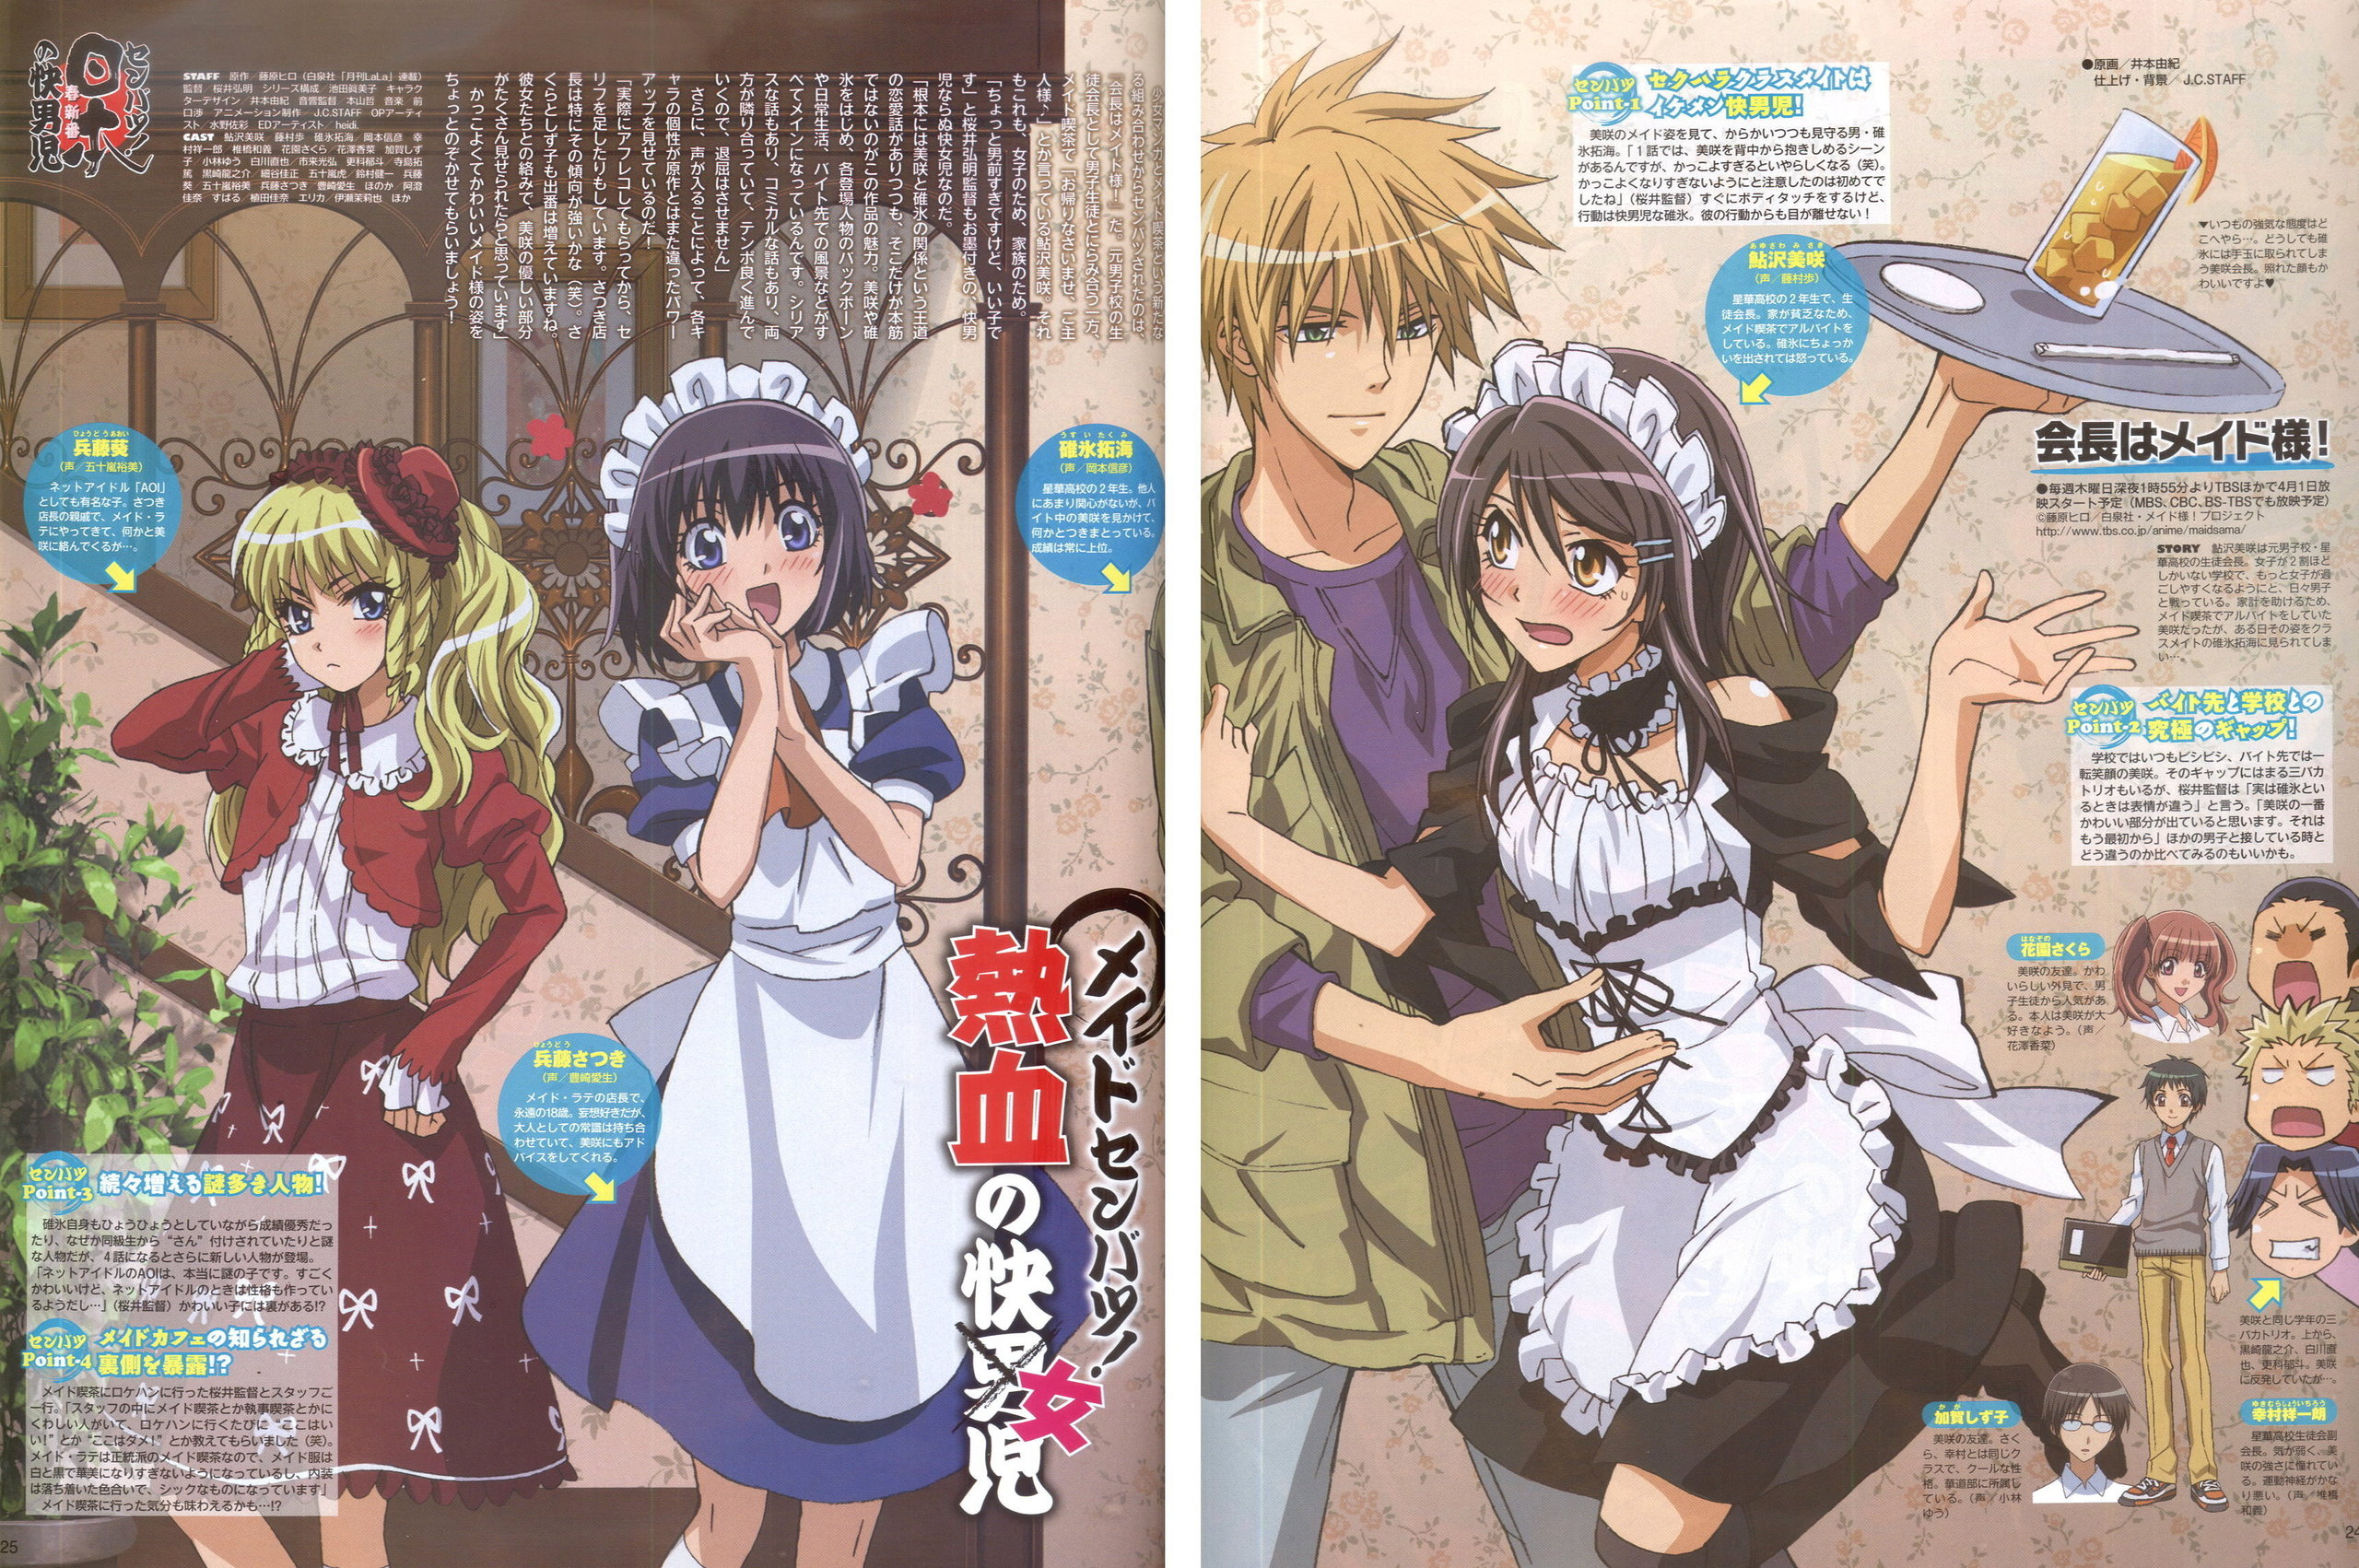 Anime like kaichou wa maid sama yahoo dating